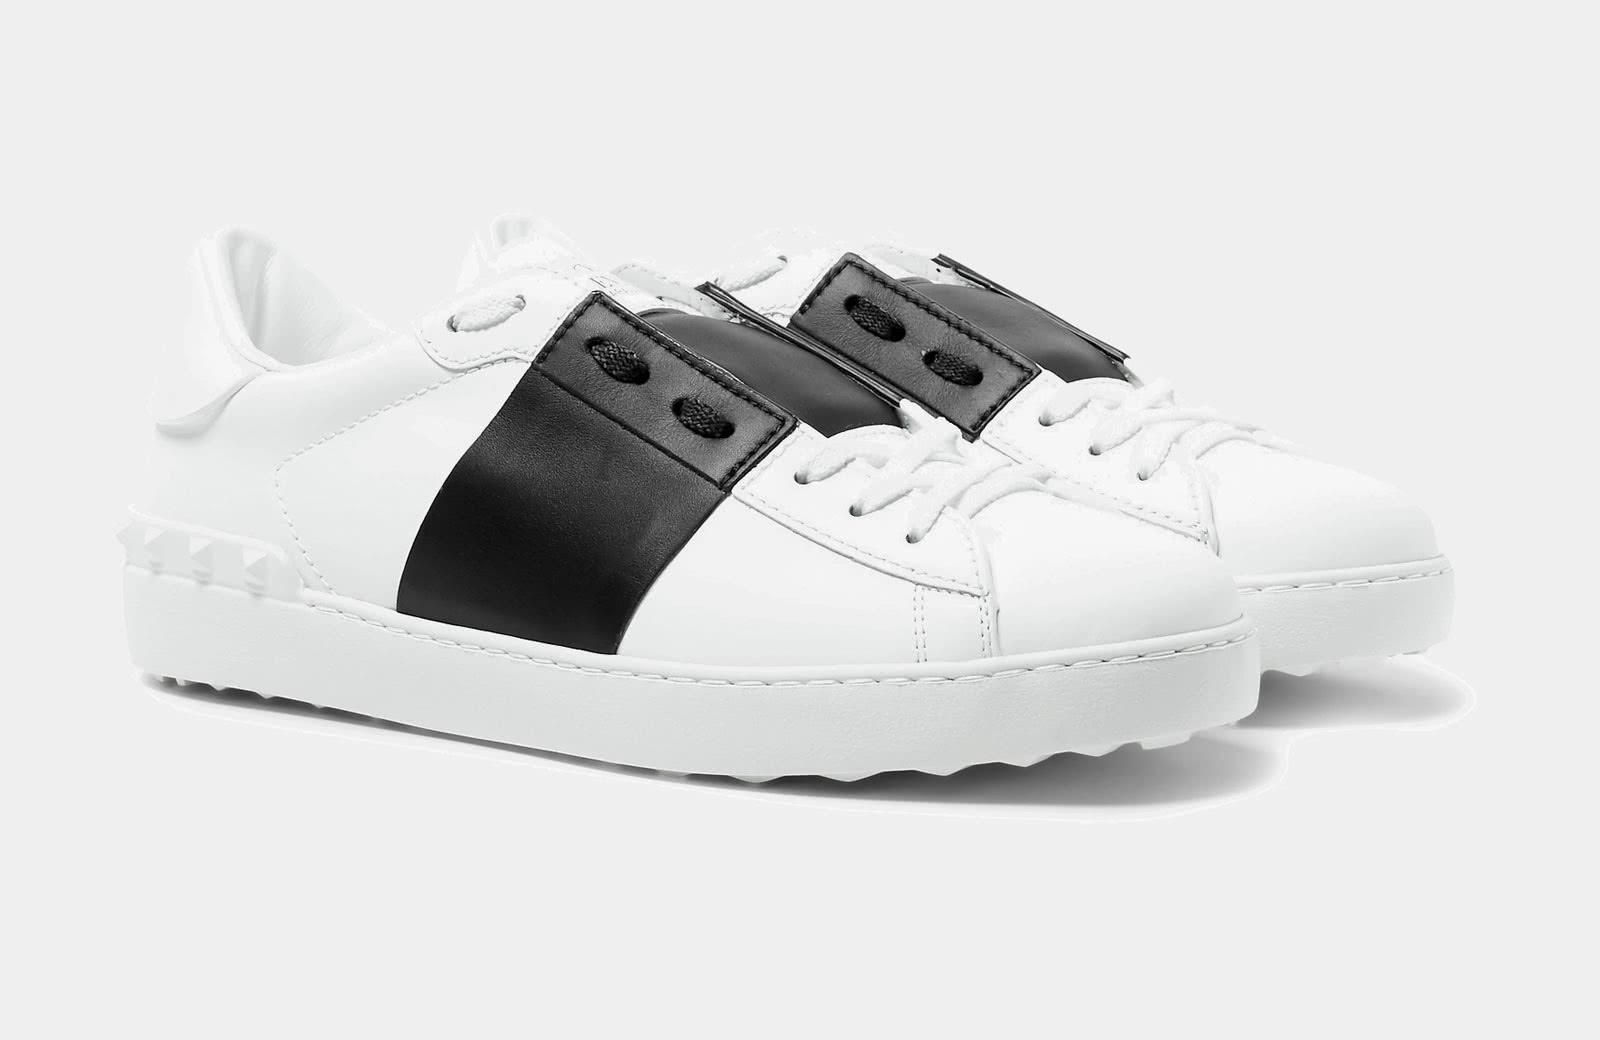 best black and white sneaker men Valentino Garavani luxury style - Luxe Digital